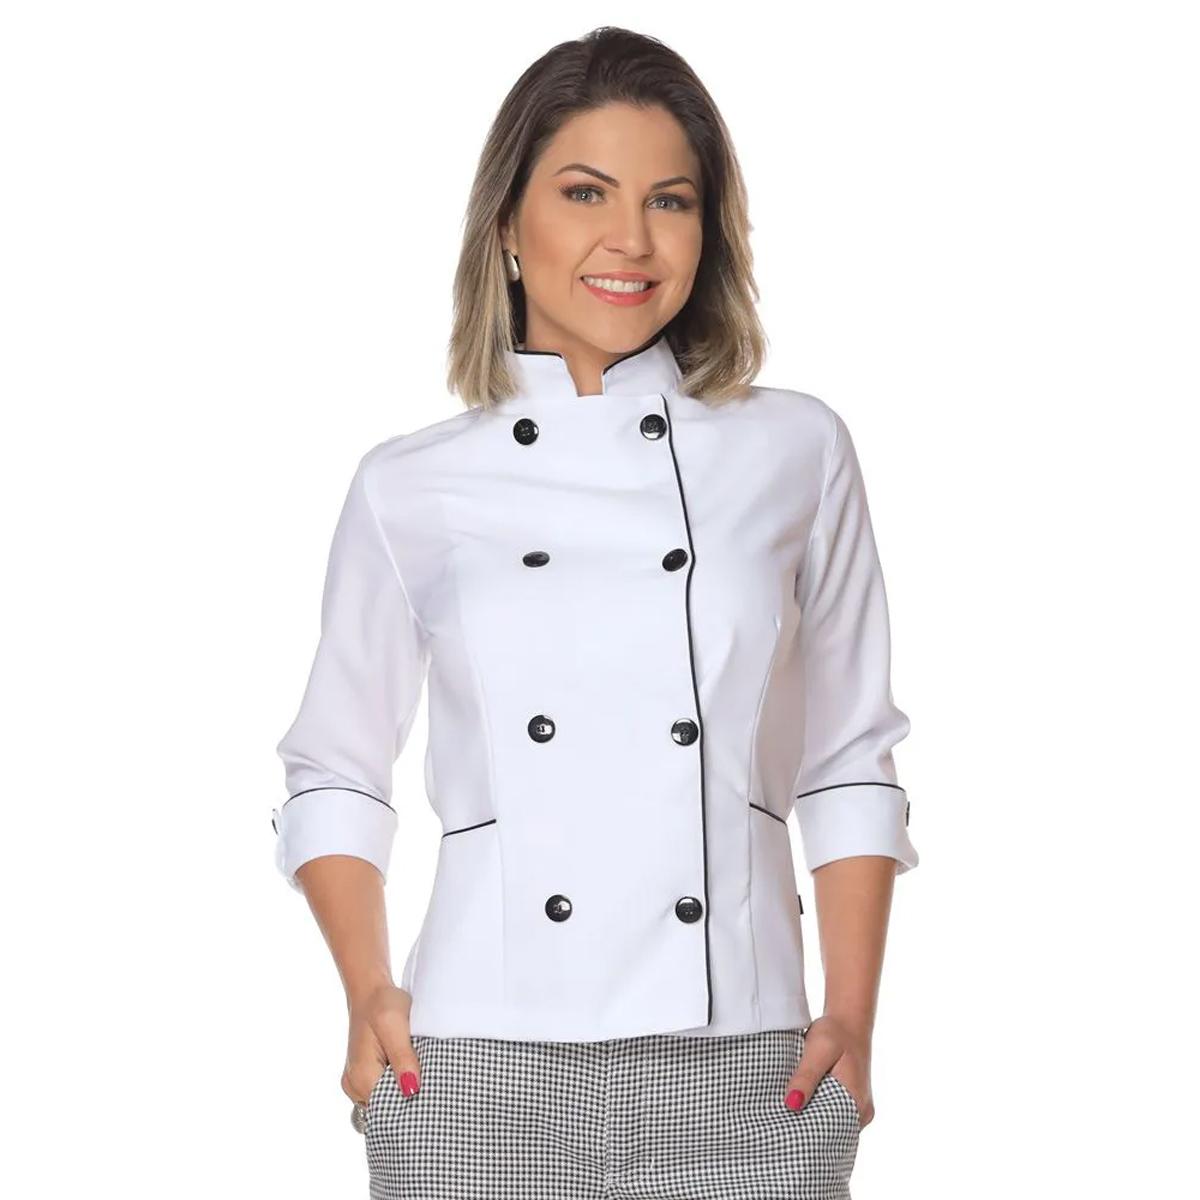 Kit 10  Dolmãs chef de cozinha feminina manga 3/4